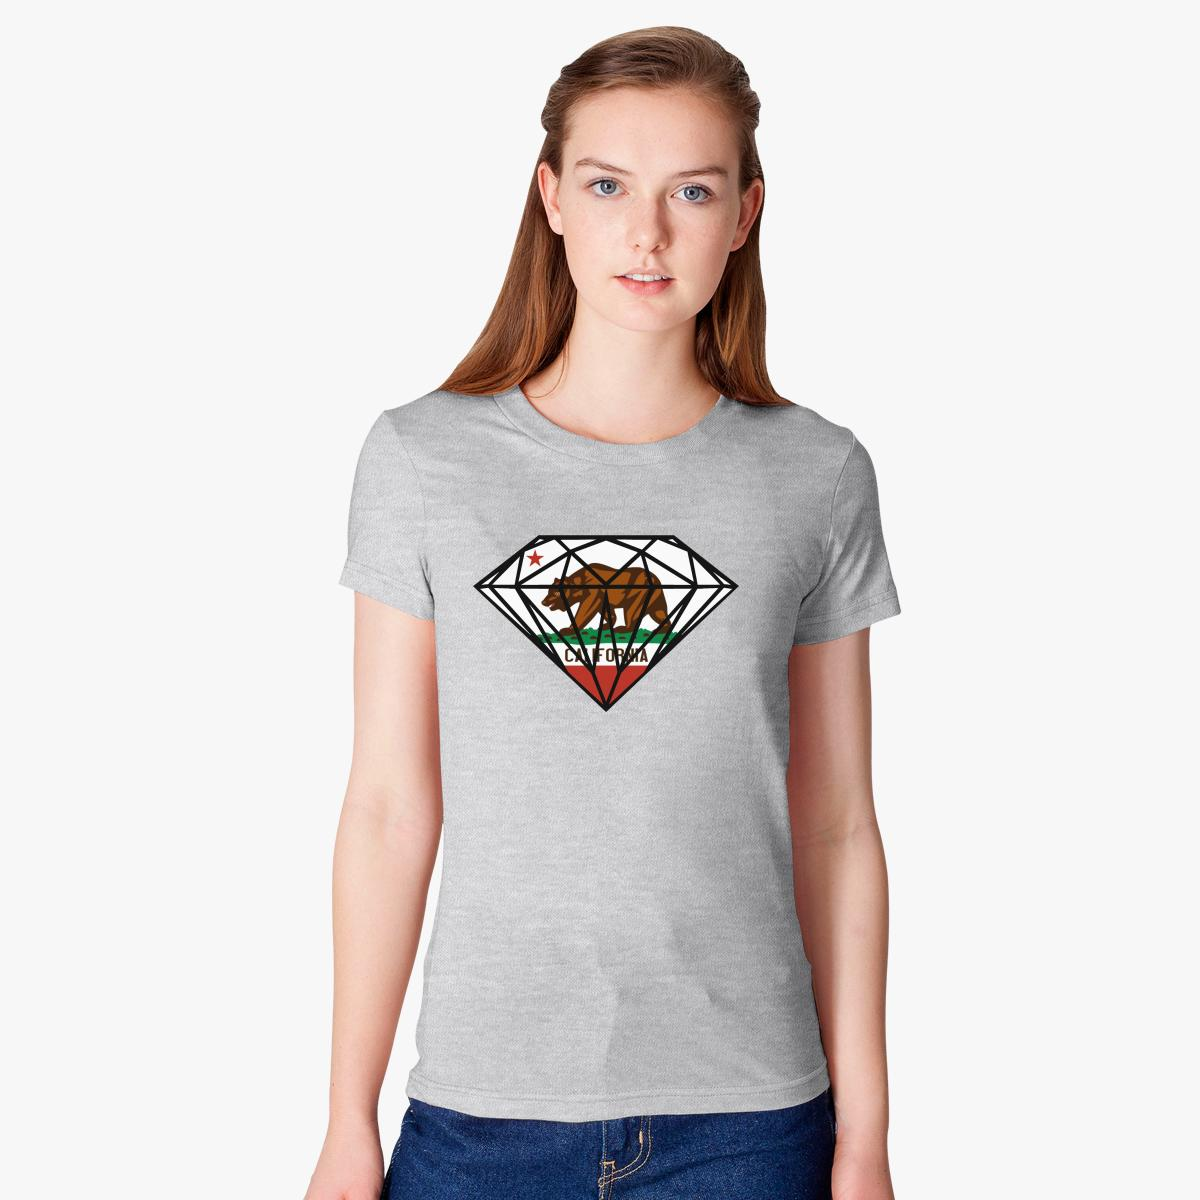 Buy California Diamond Women's T-shirt, 53748